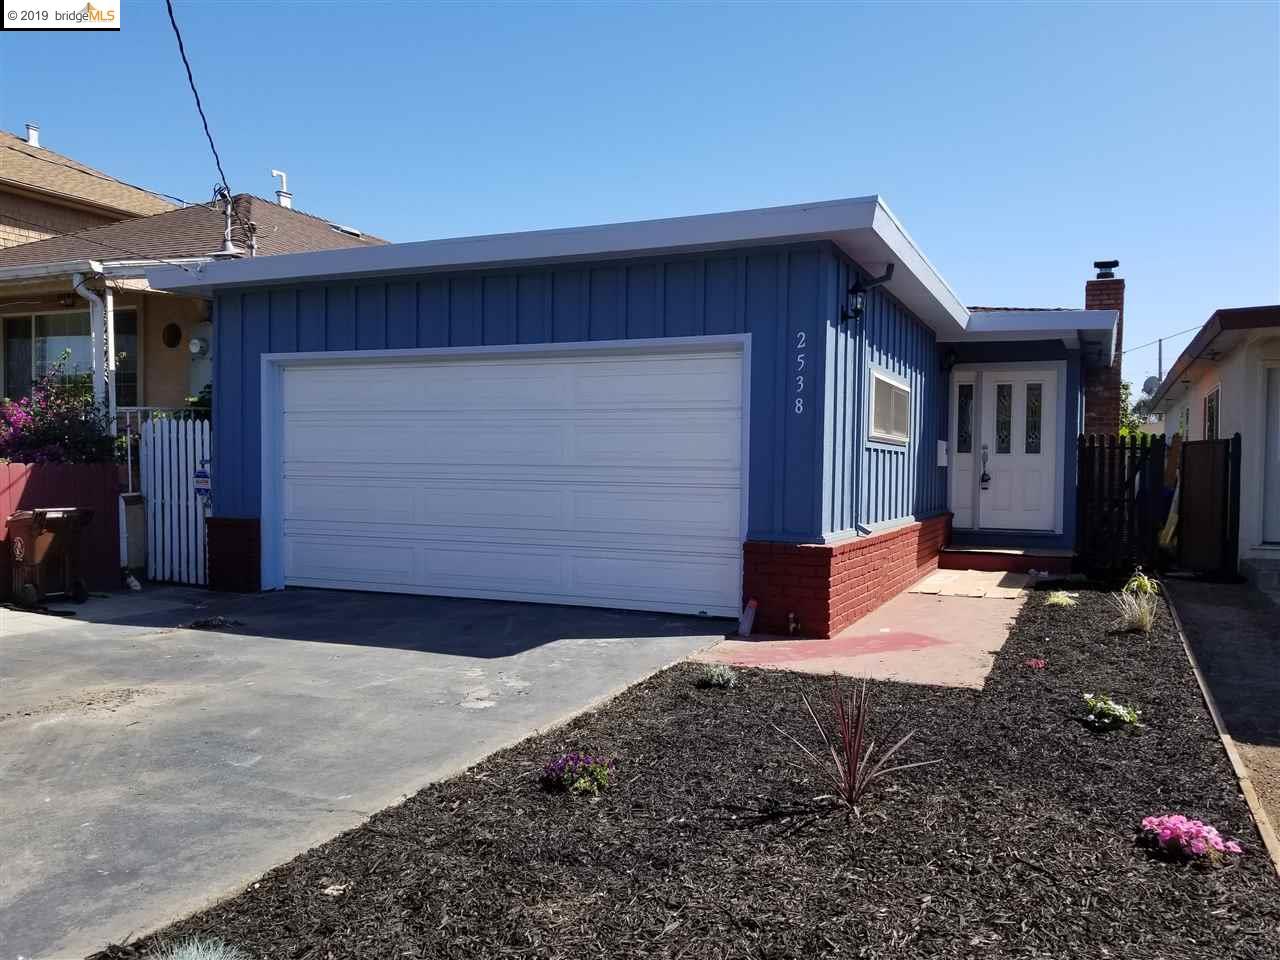 2538 CLINTON AVE, RICHMOND, CA 94804